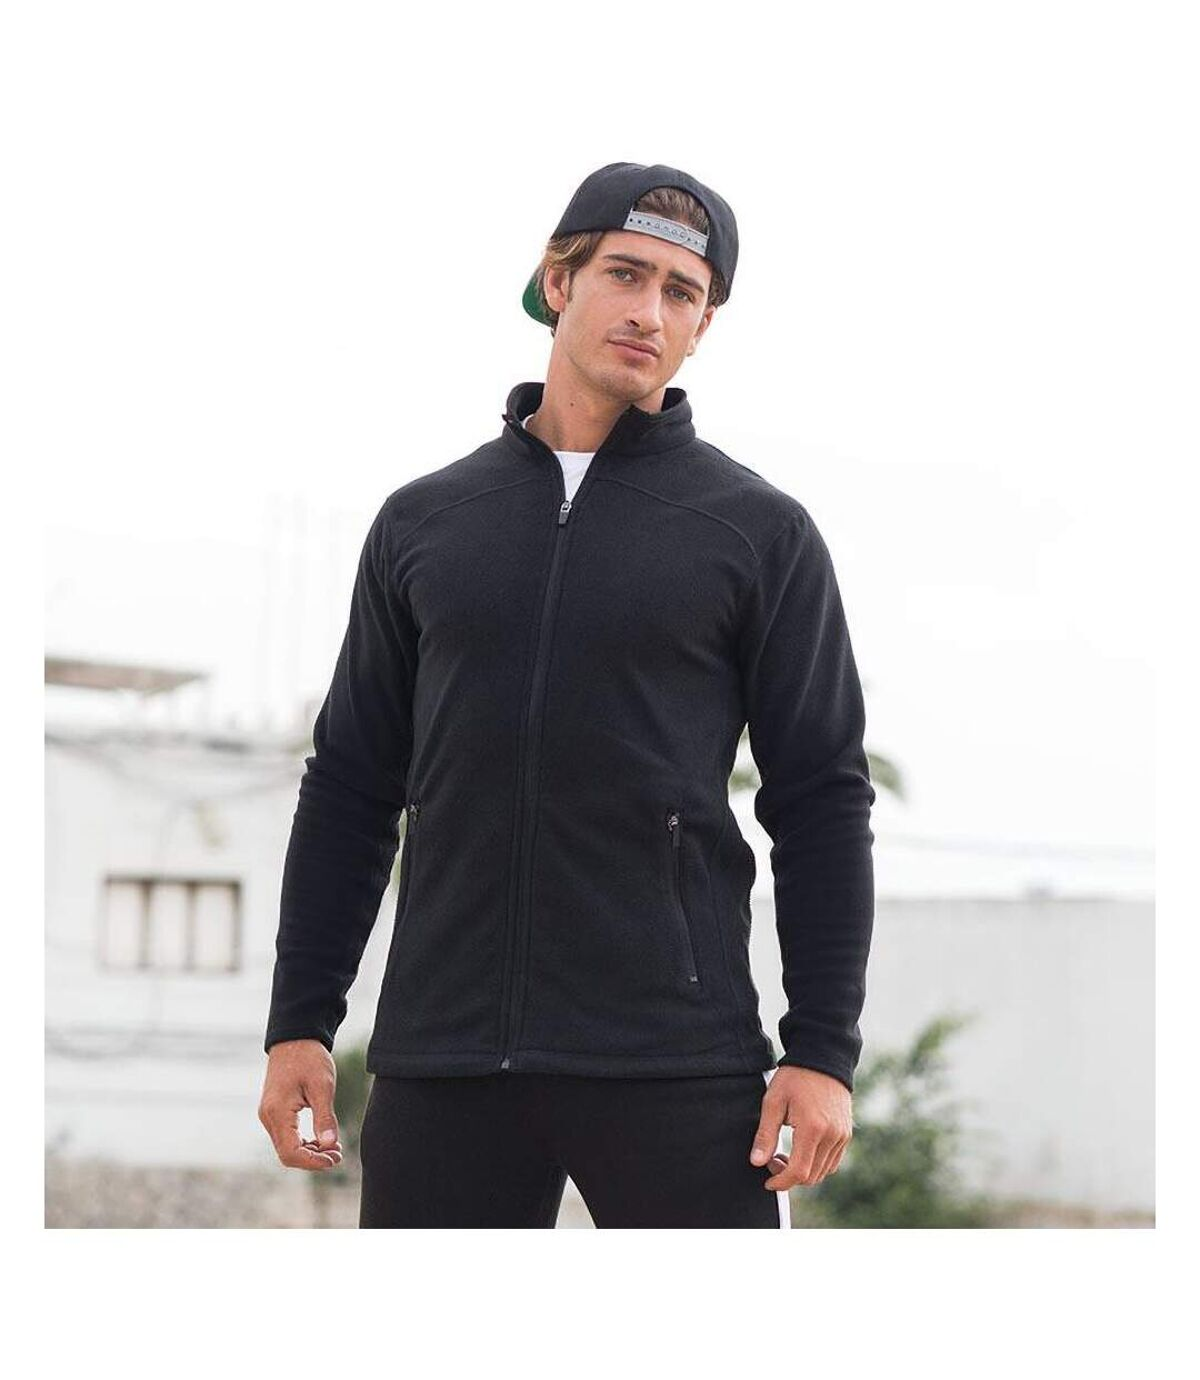 Skinni Fit Mens Microfleece Anti Pill Lightweight Jacket (Black) - UTRW1397